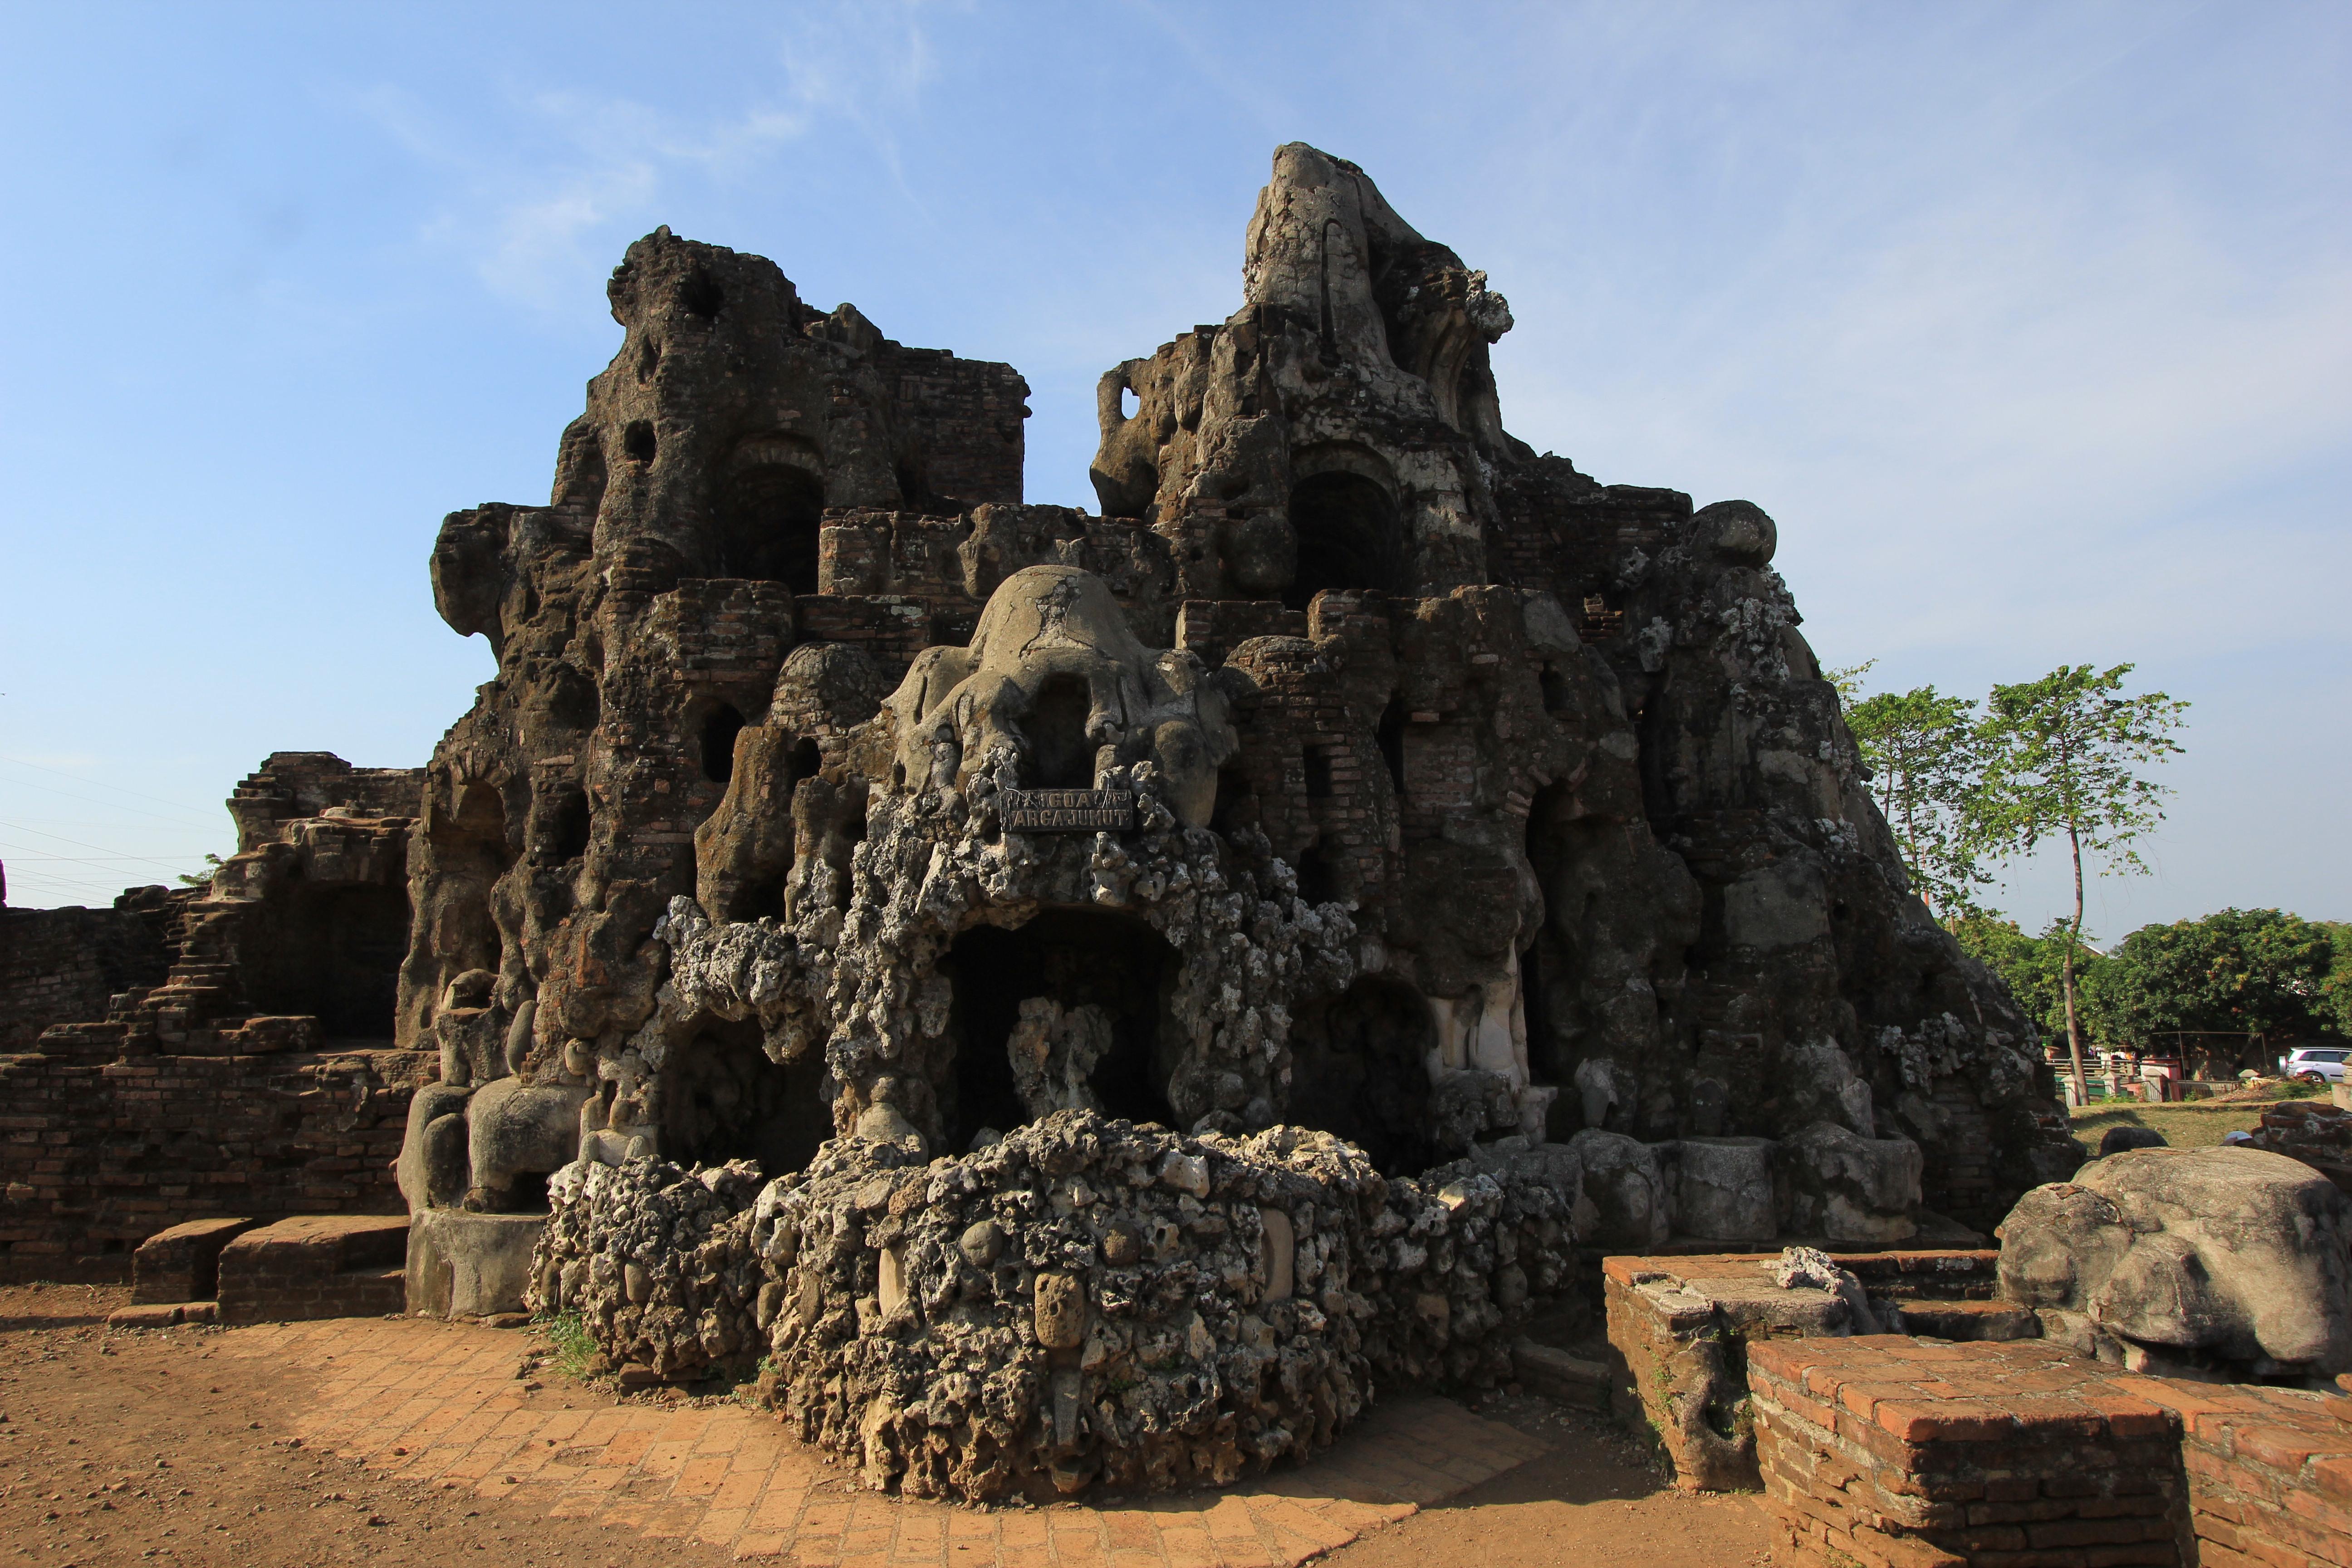 Sunyaragi Cirebon